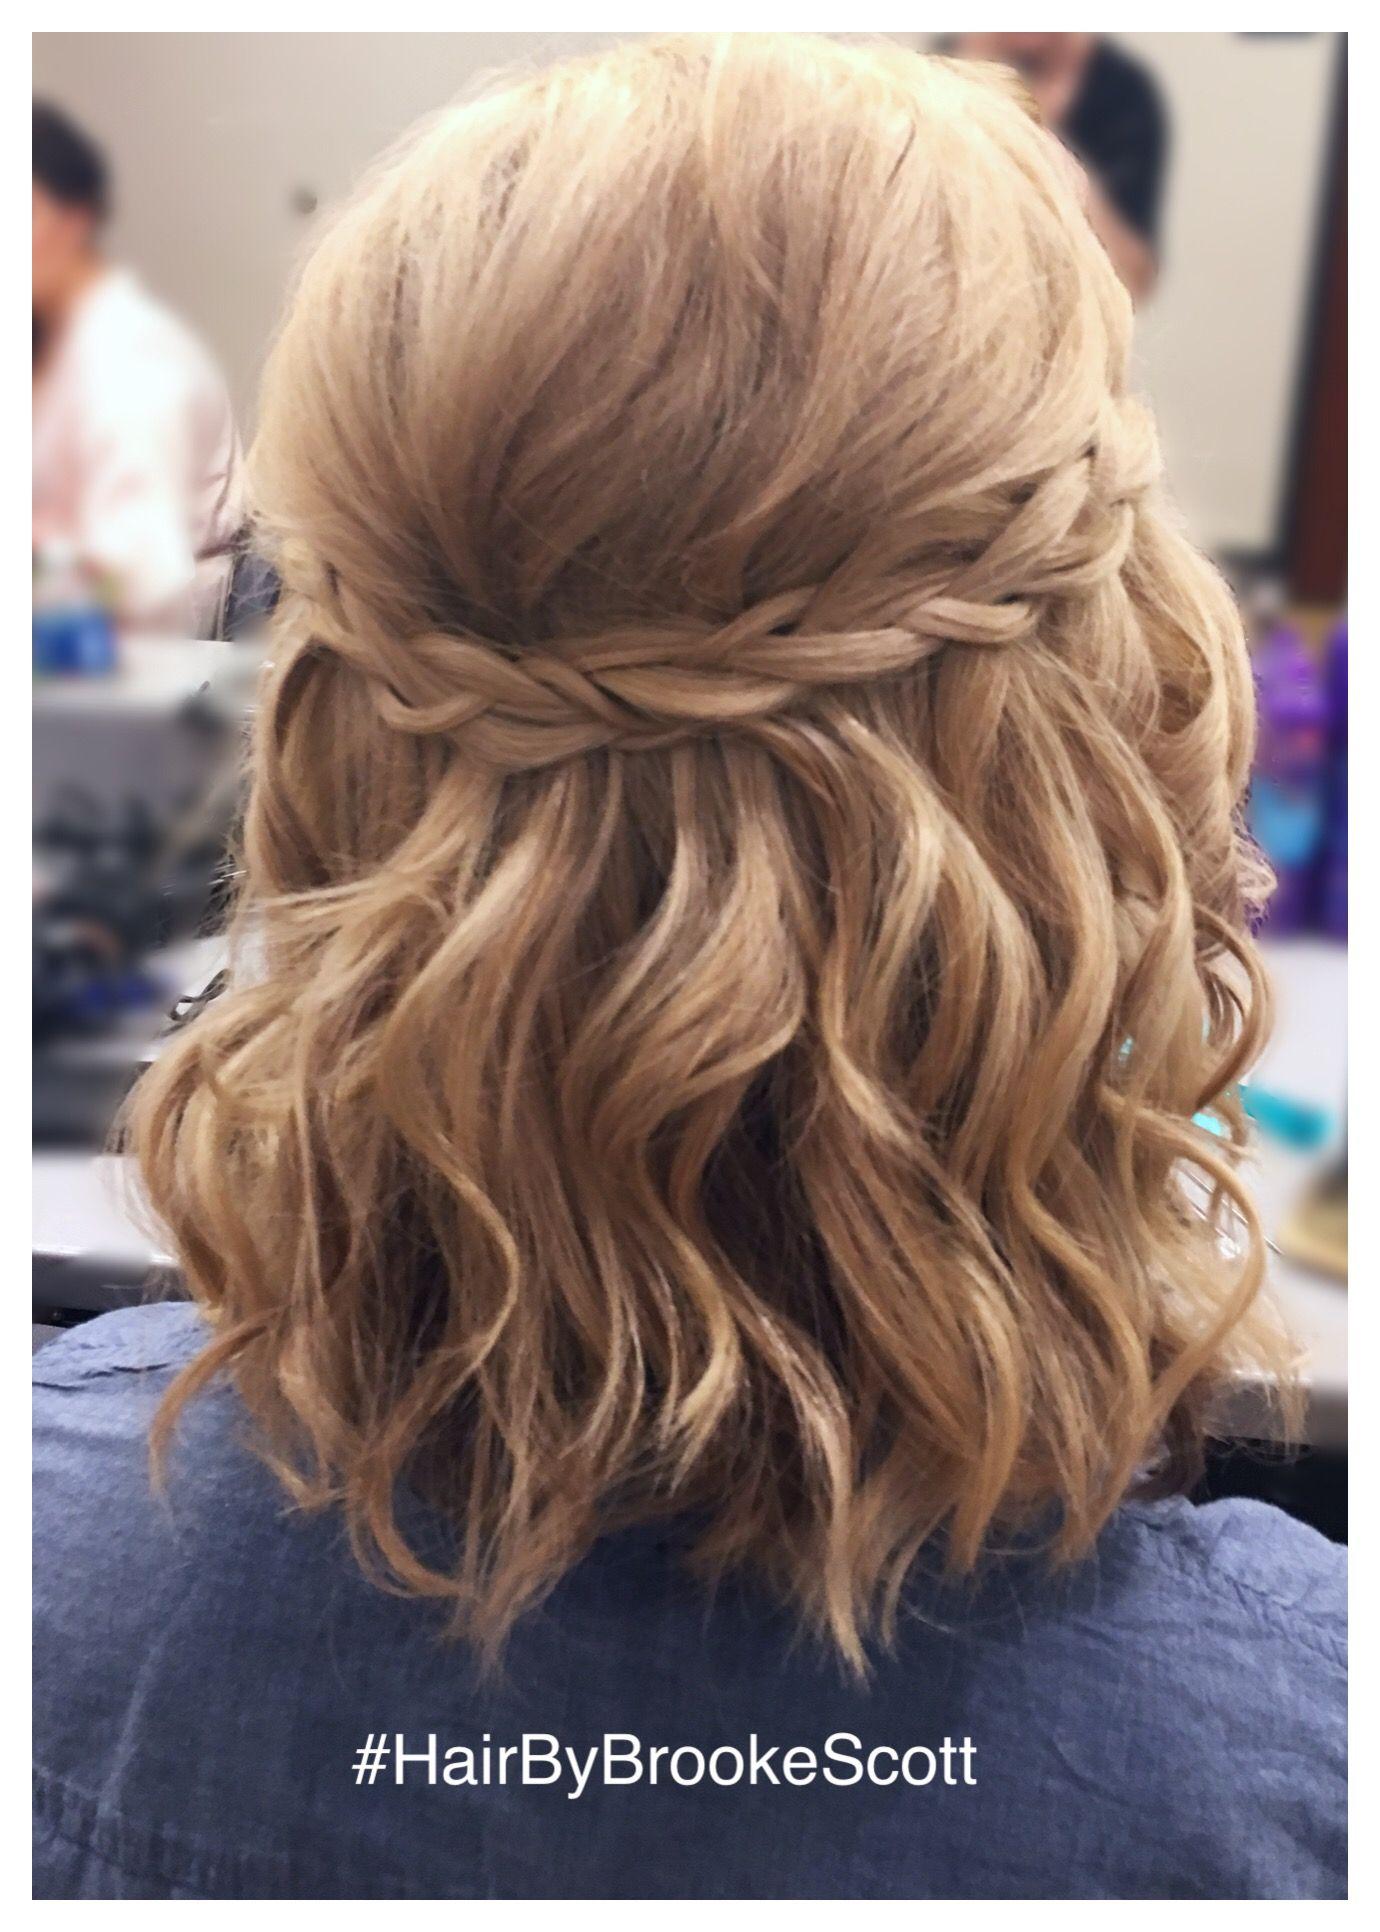 Simple braided half updo for short hair done by Brooke at AV Beauty Bar in OTR (…